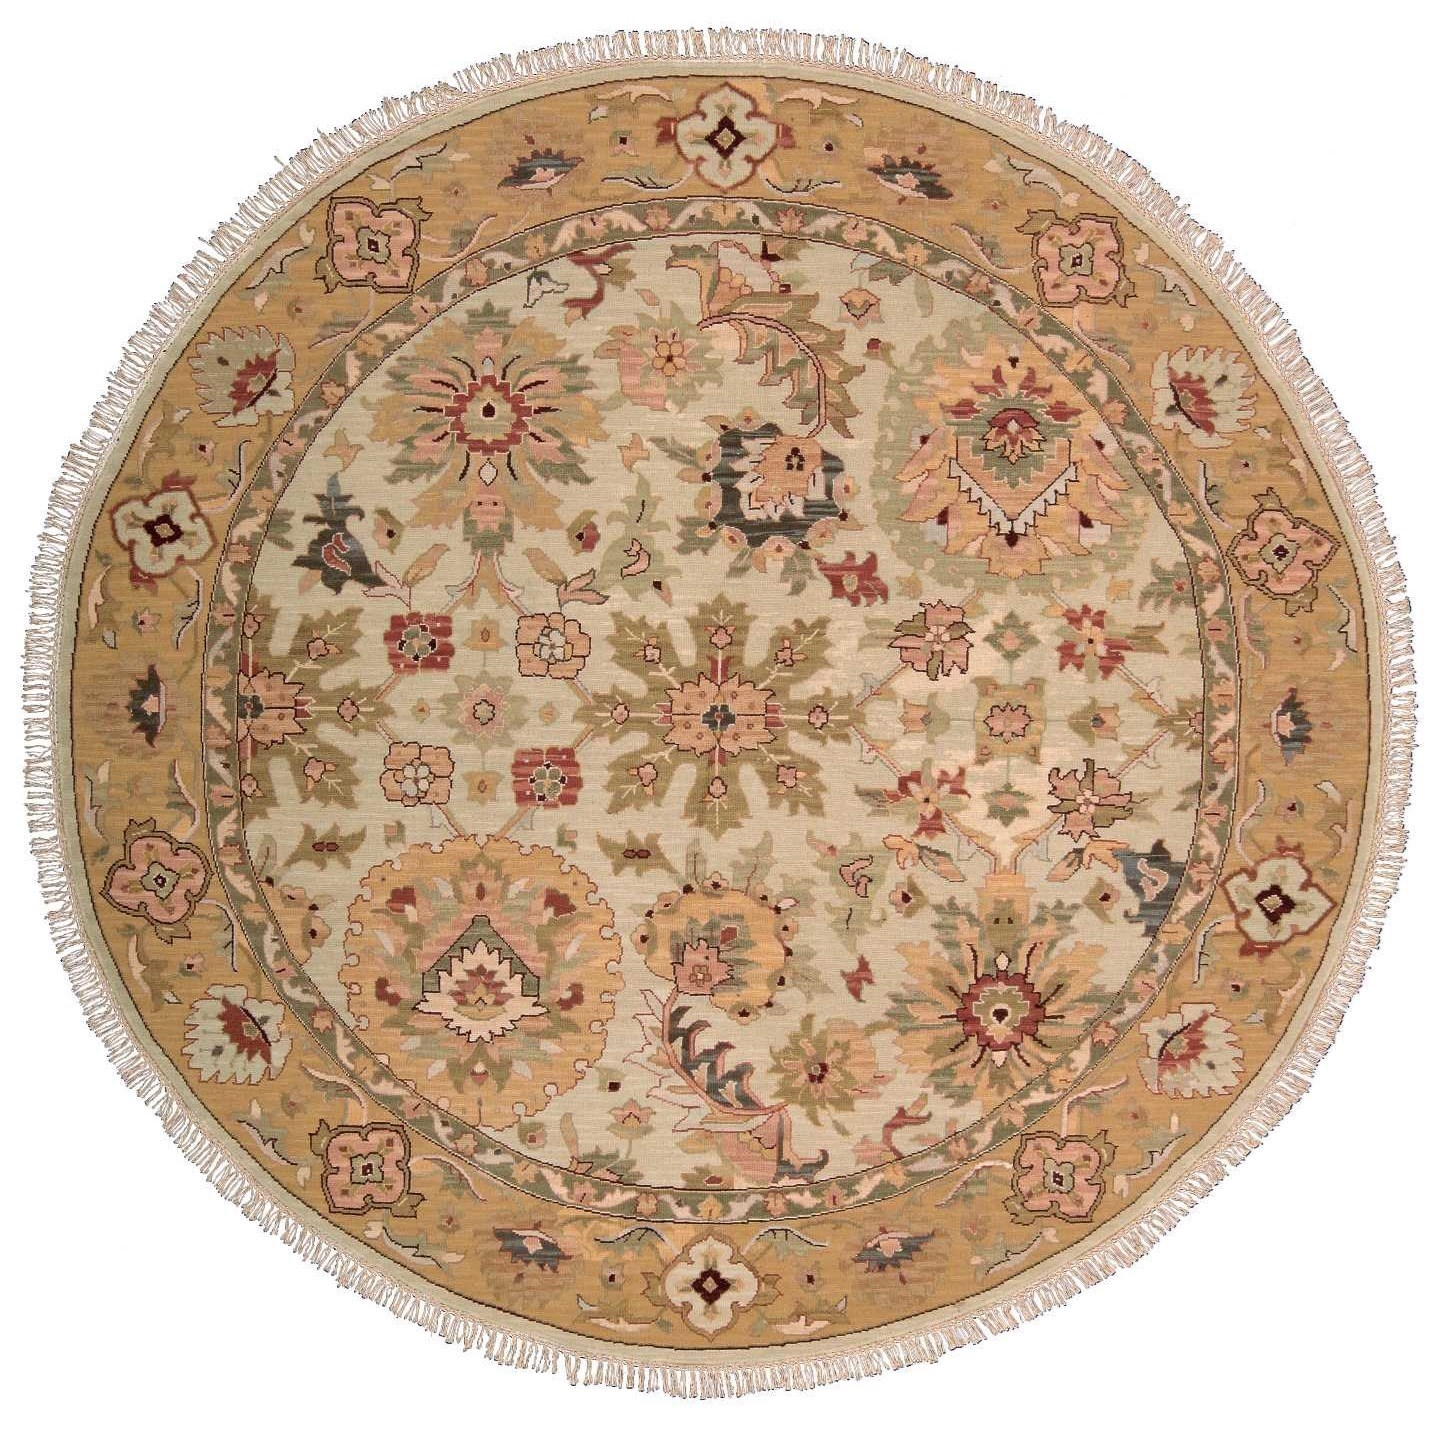 Nourison Nourmak 8' x 8' Beige Round Rug - Item Number: S174 BGE 8X8